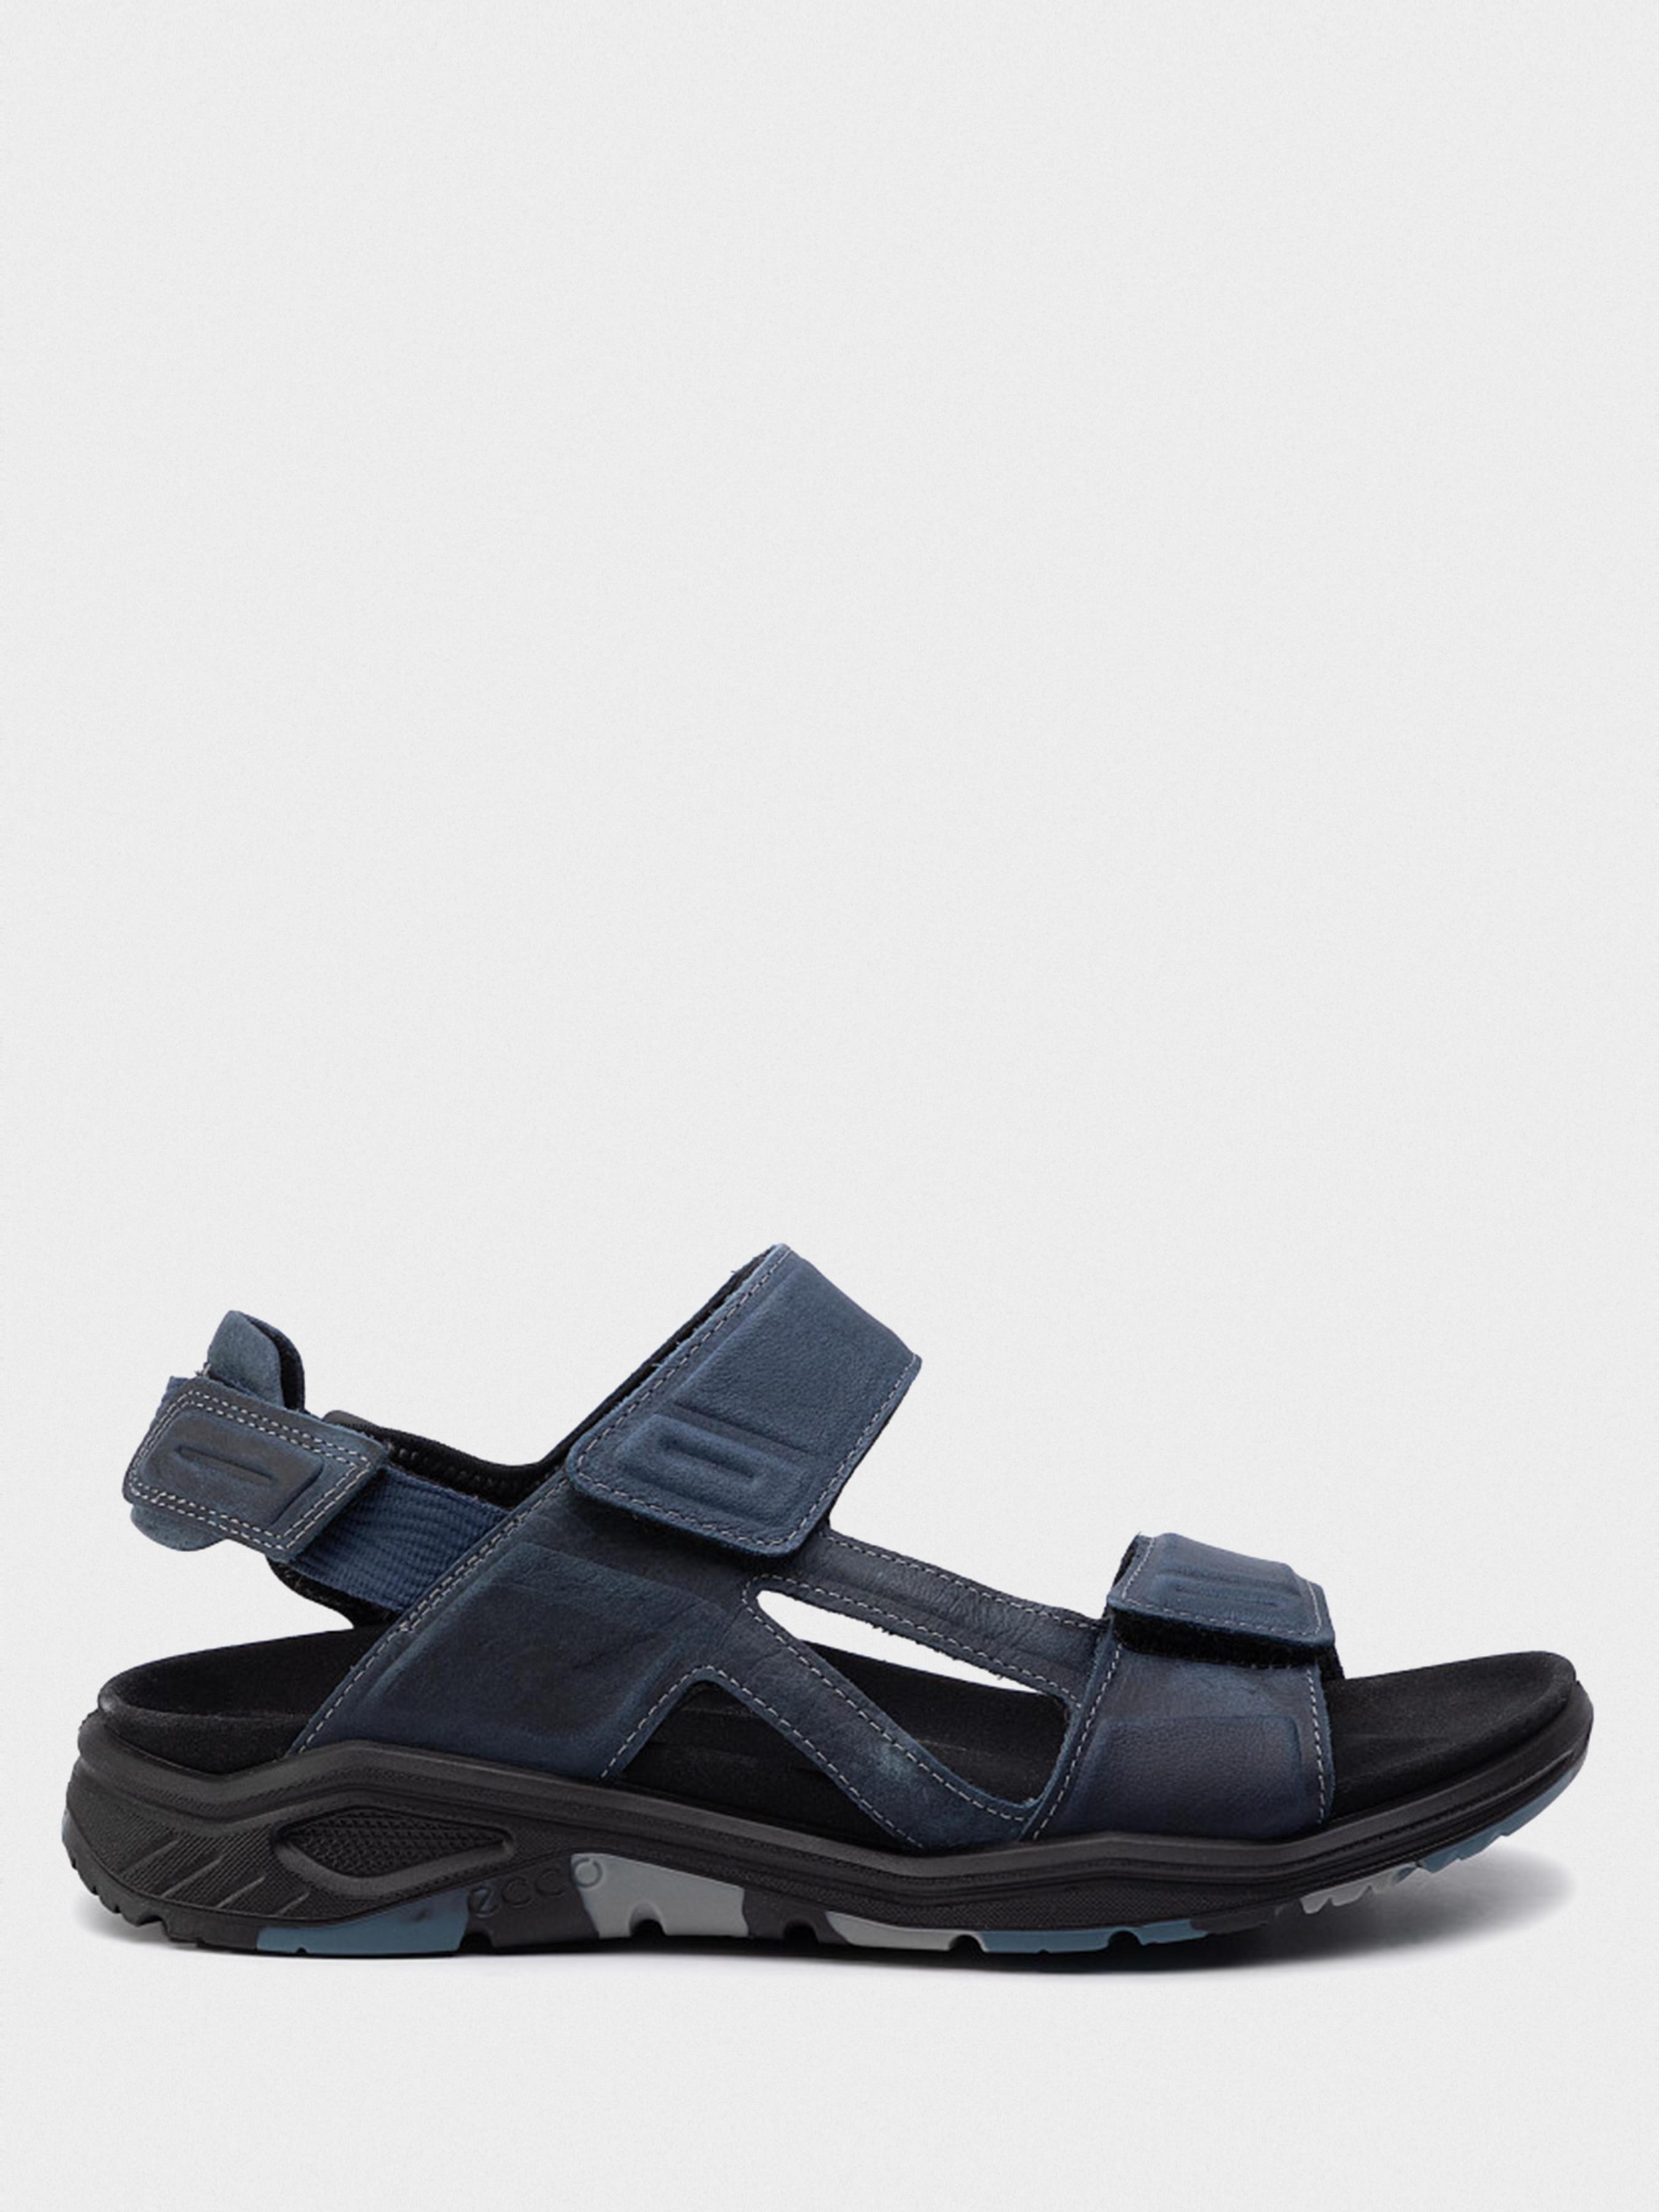 Сандалии мужские ECCO X-TRINSIC ZM4161 модная обувь, 2017